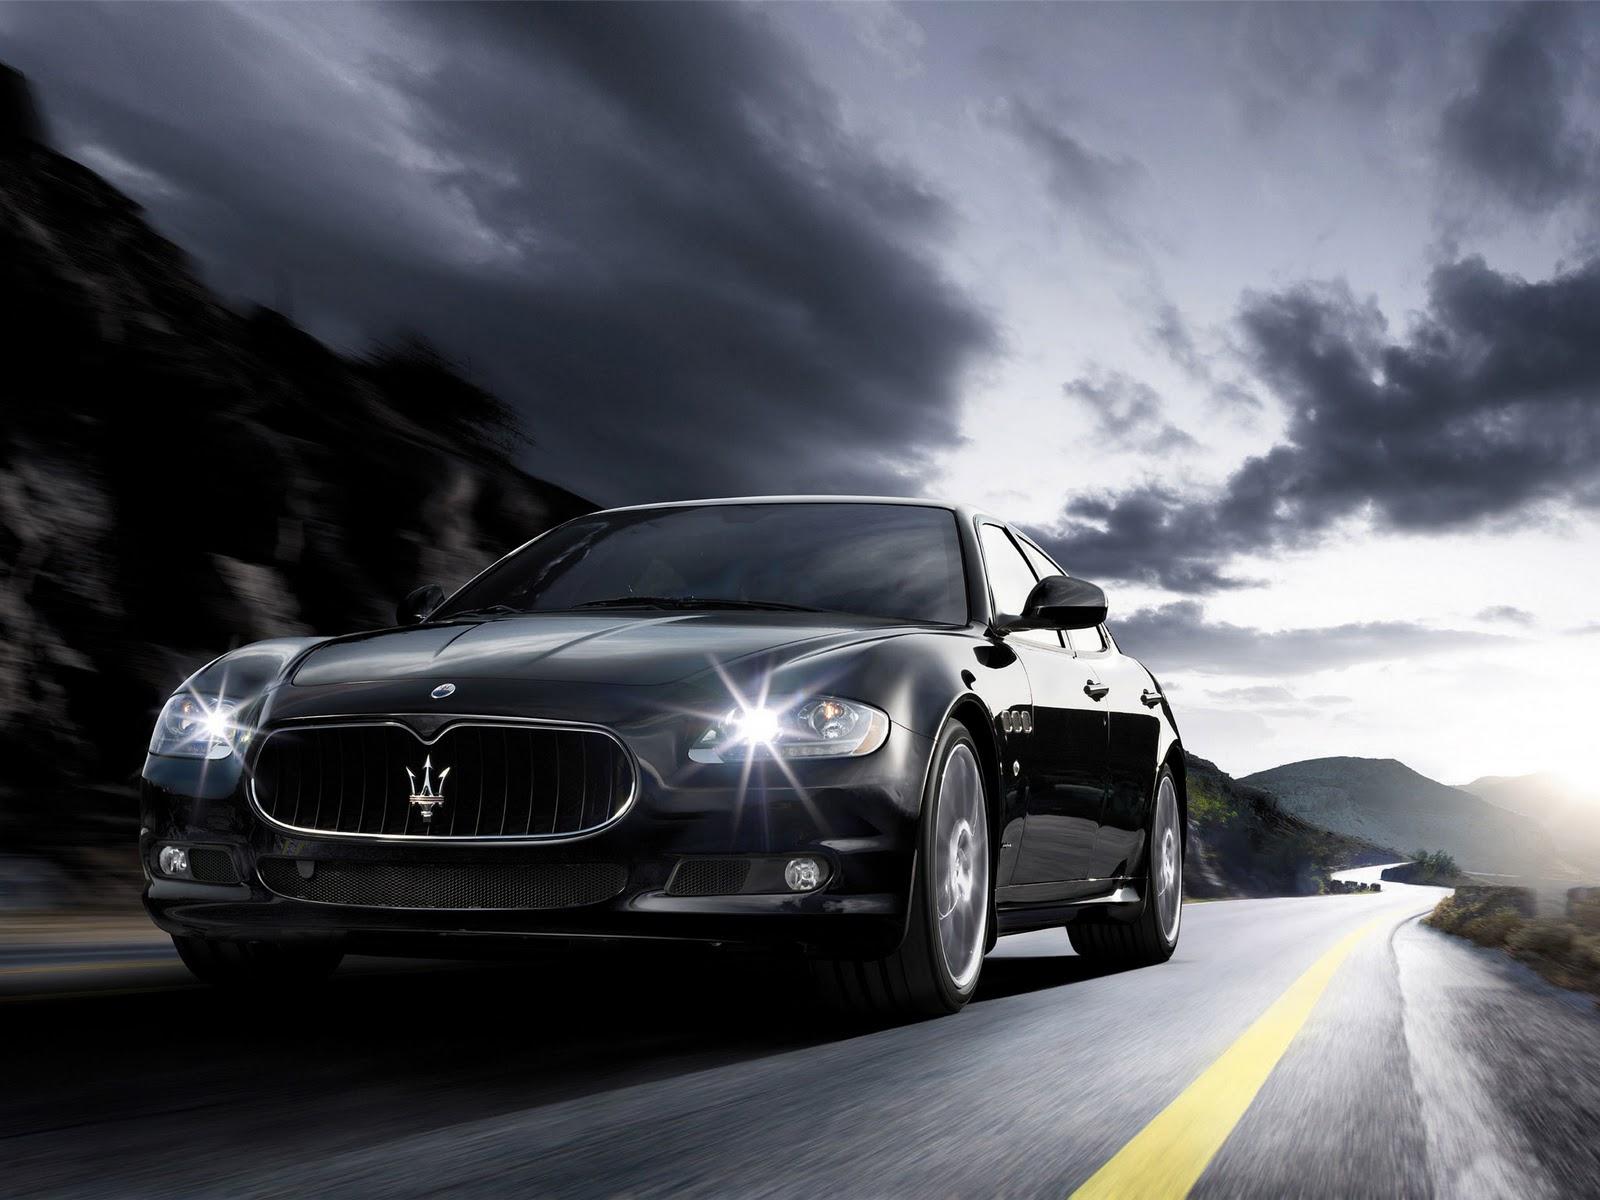 Free Cars Hd Wallpapers Maserati Quattroporte S Sport Car